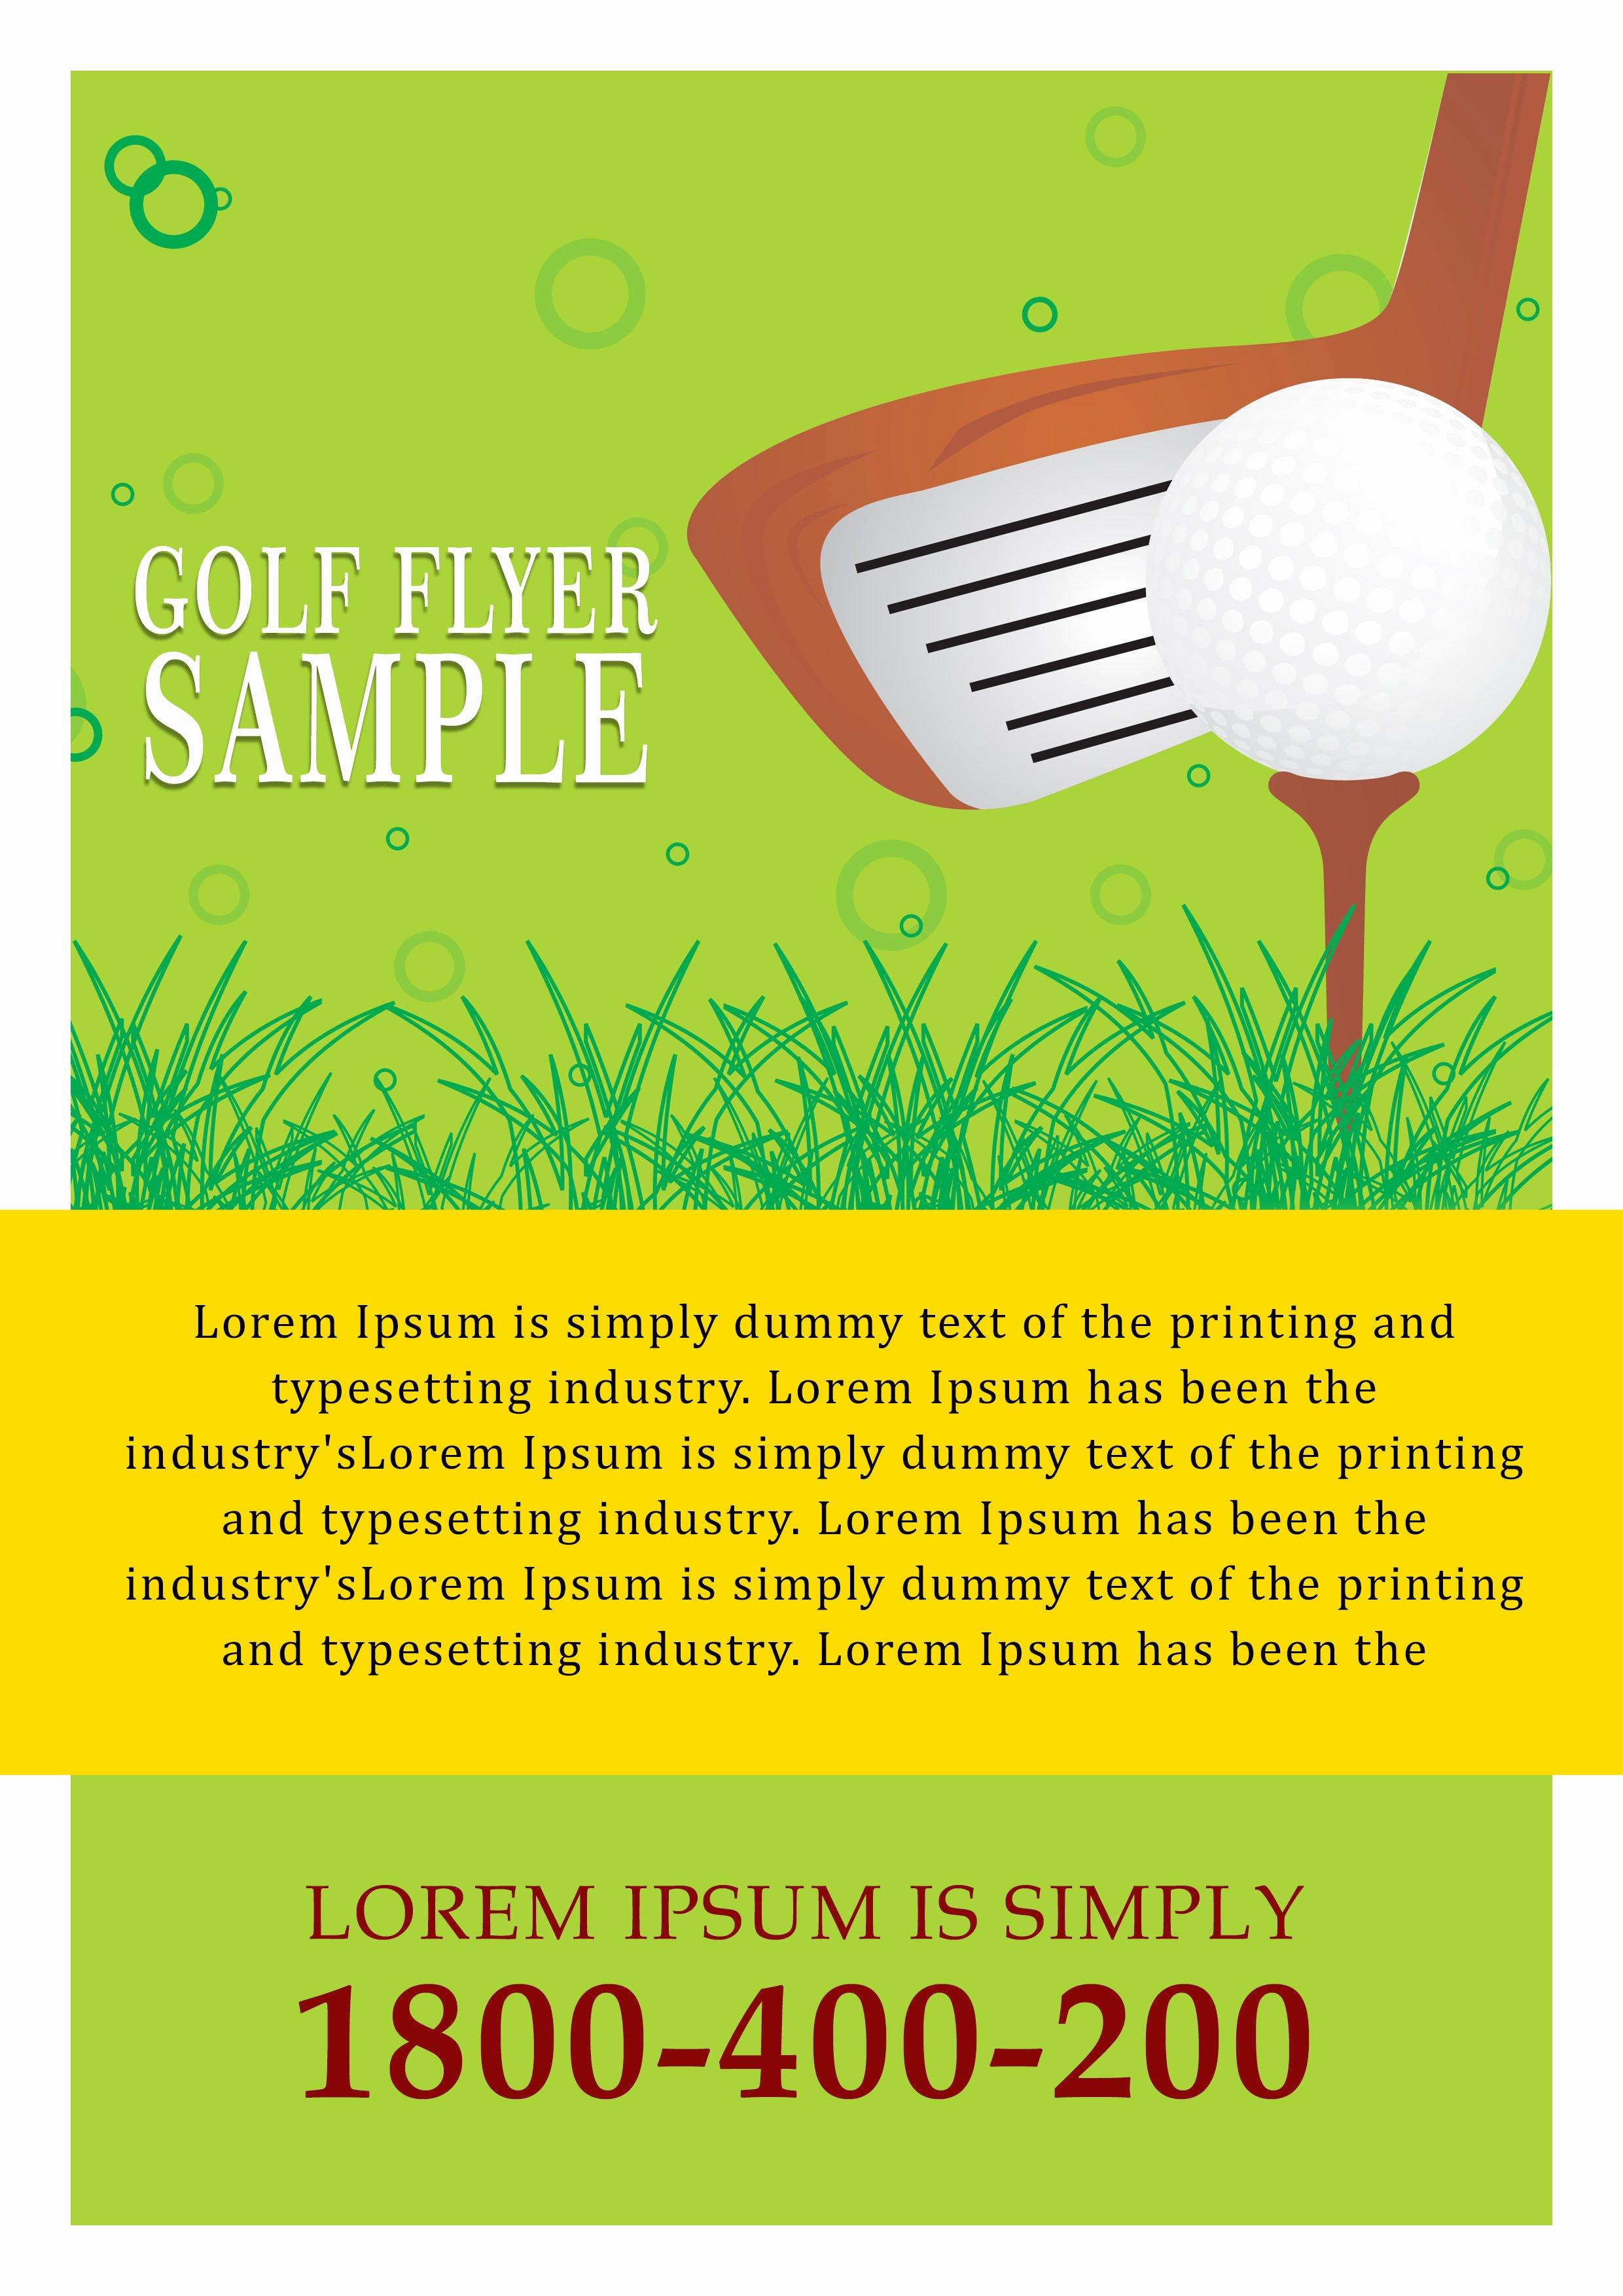 Golf Flyer Template Free Best Of 15 Free Golf tournament Flyer Templates Fundraiser